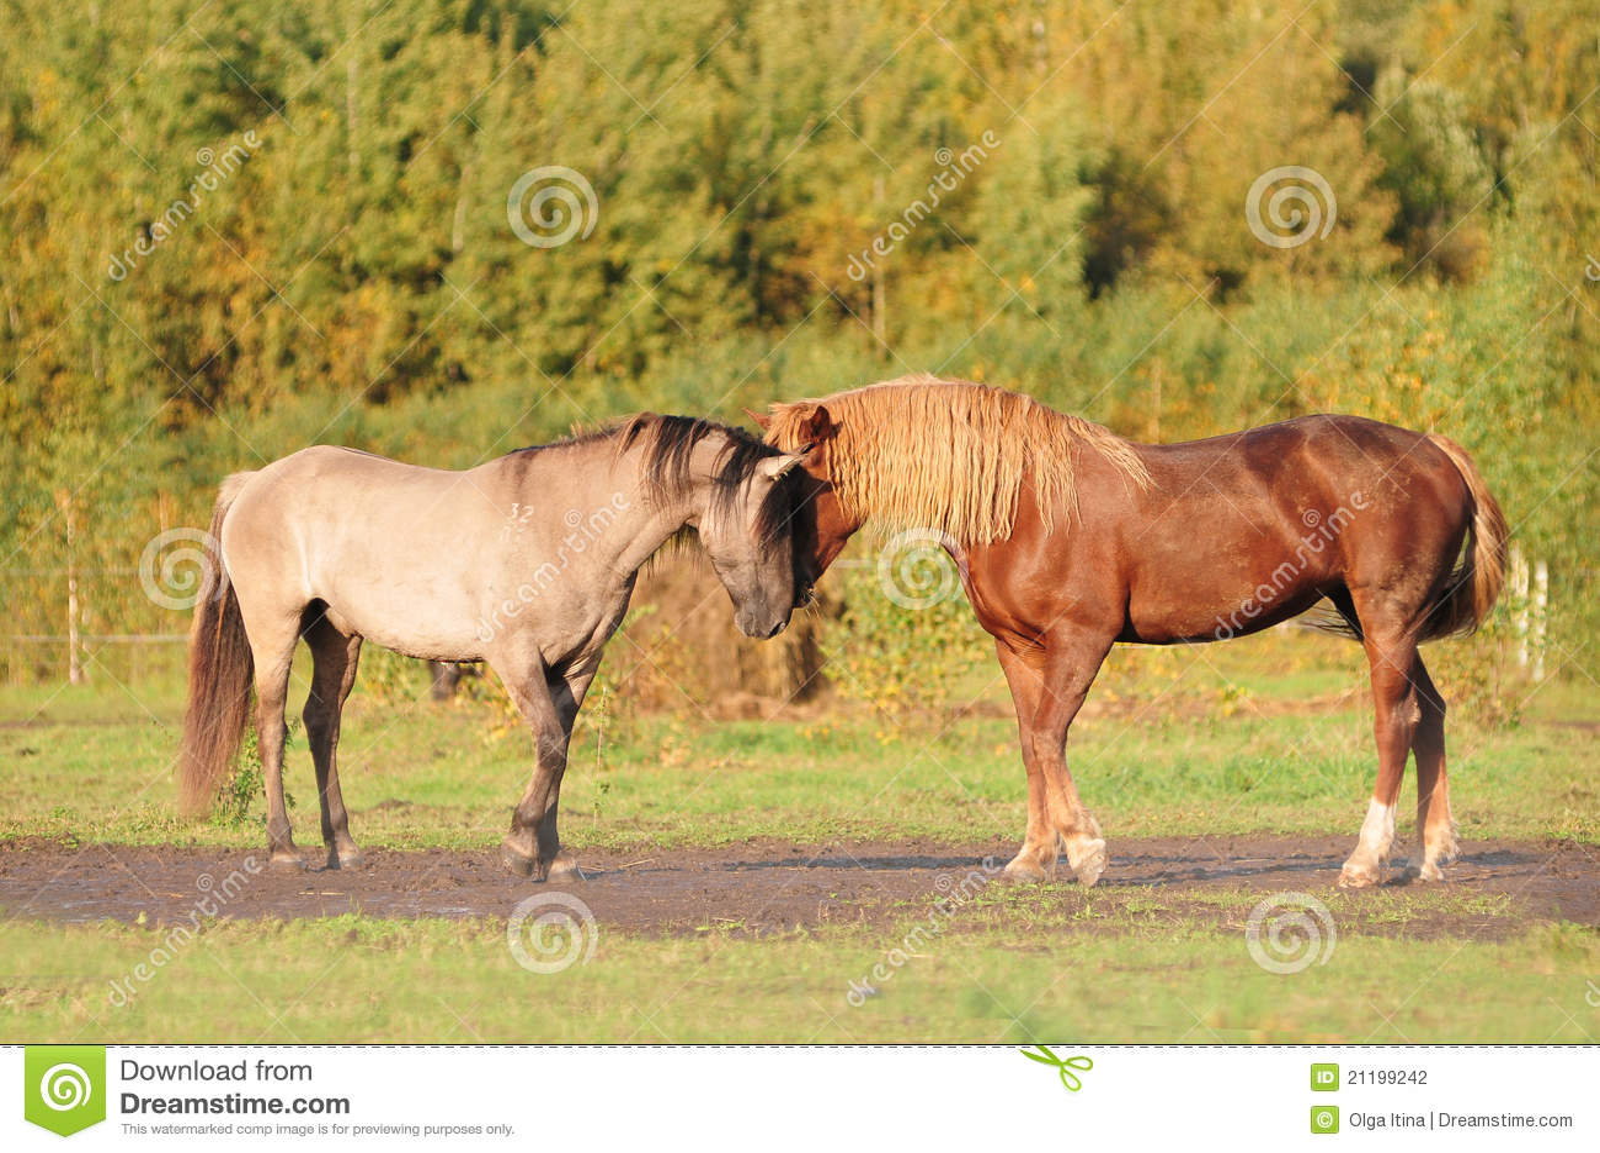 Two horses communicating